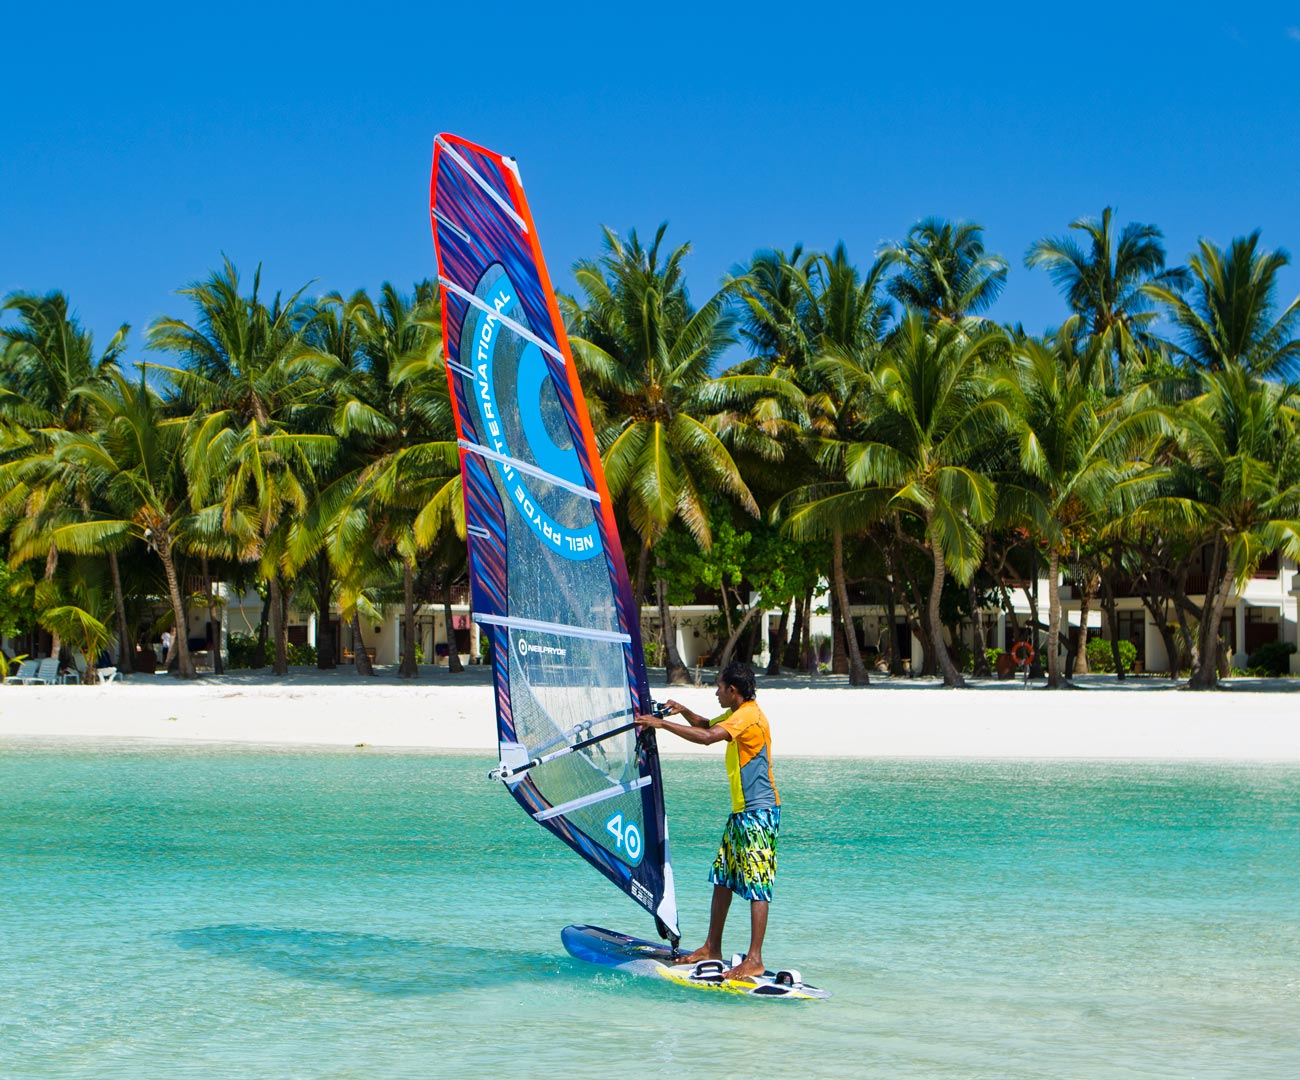 Wind Surfing in the Maldives Image | Kurumba Maldives Watersports